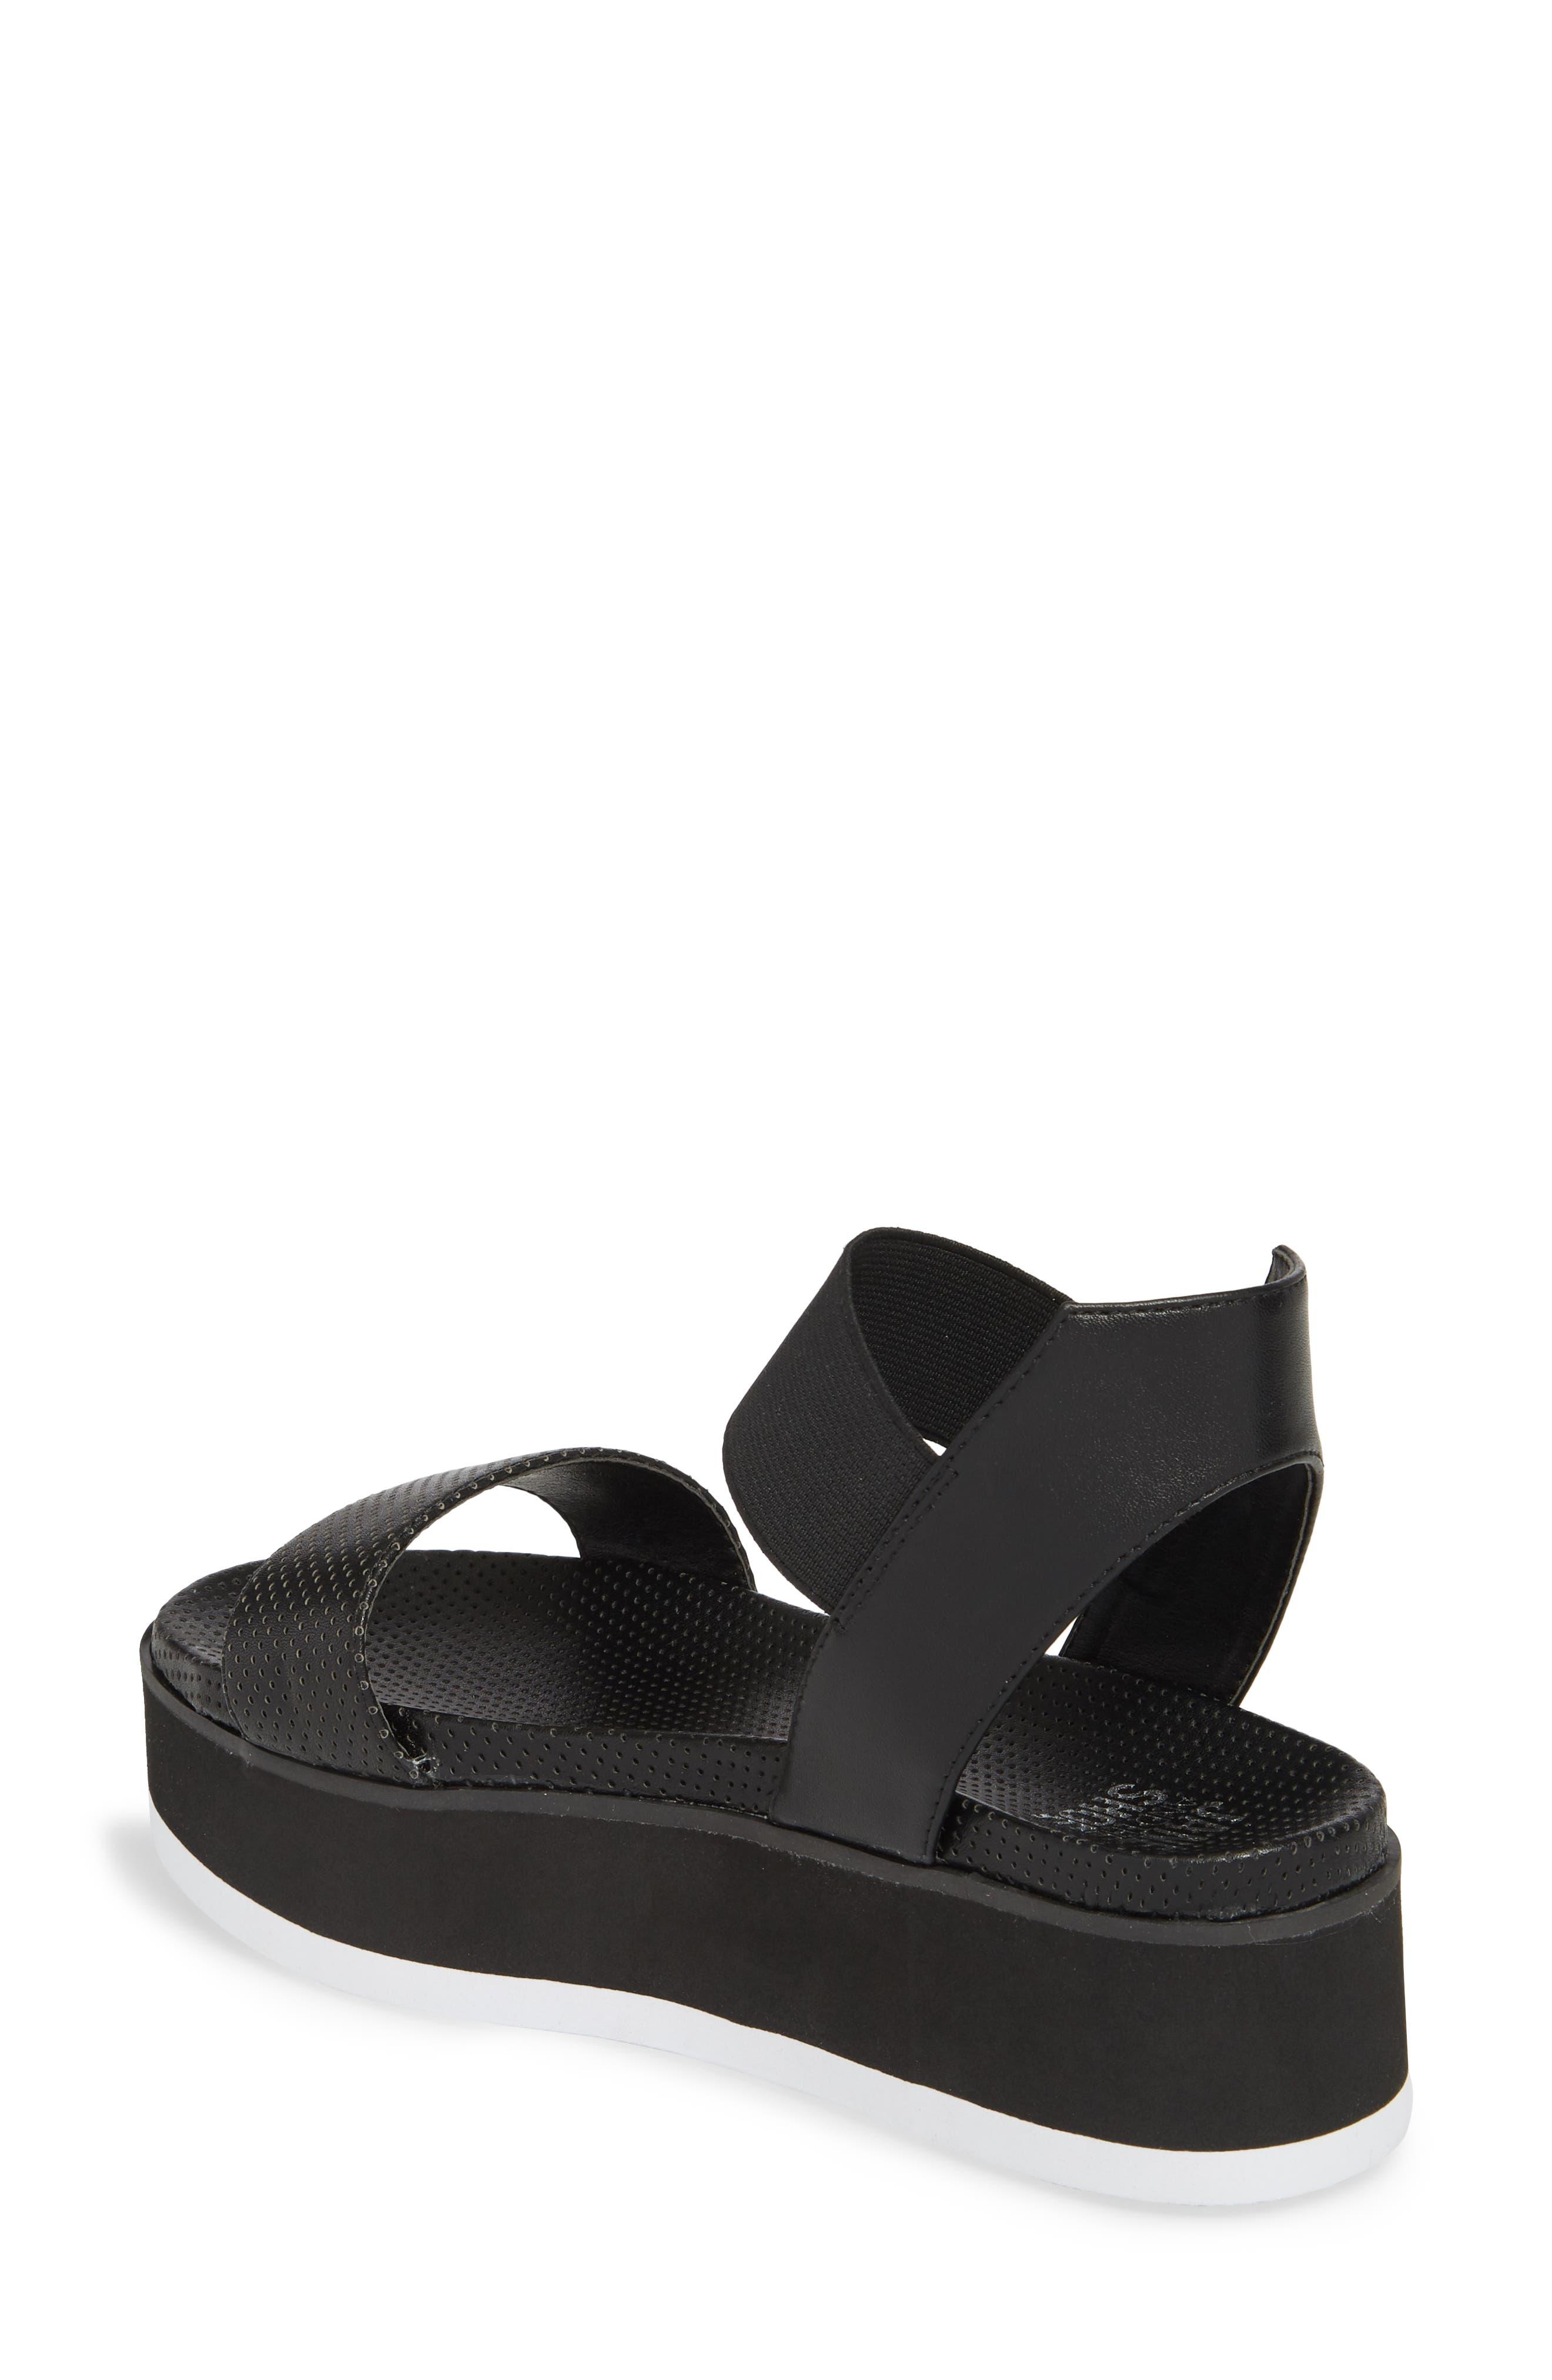 Josie Perforated Platform Sandal,                             Alternate thumbnail 2, color,                             BLACK